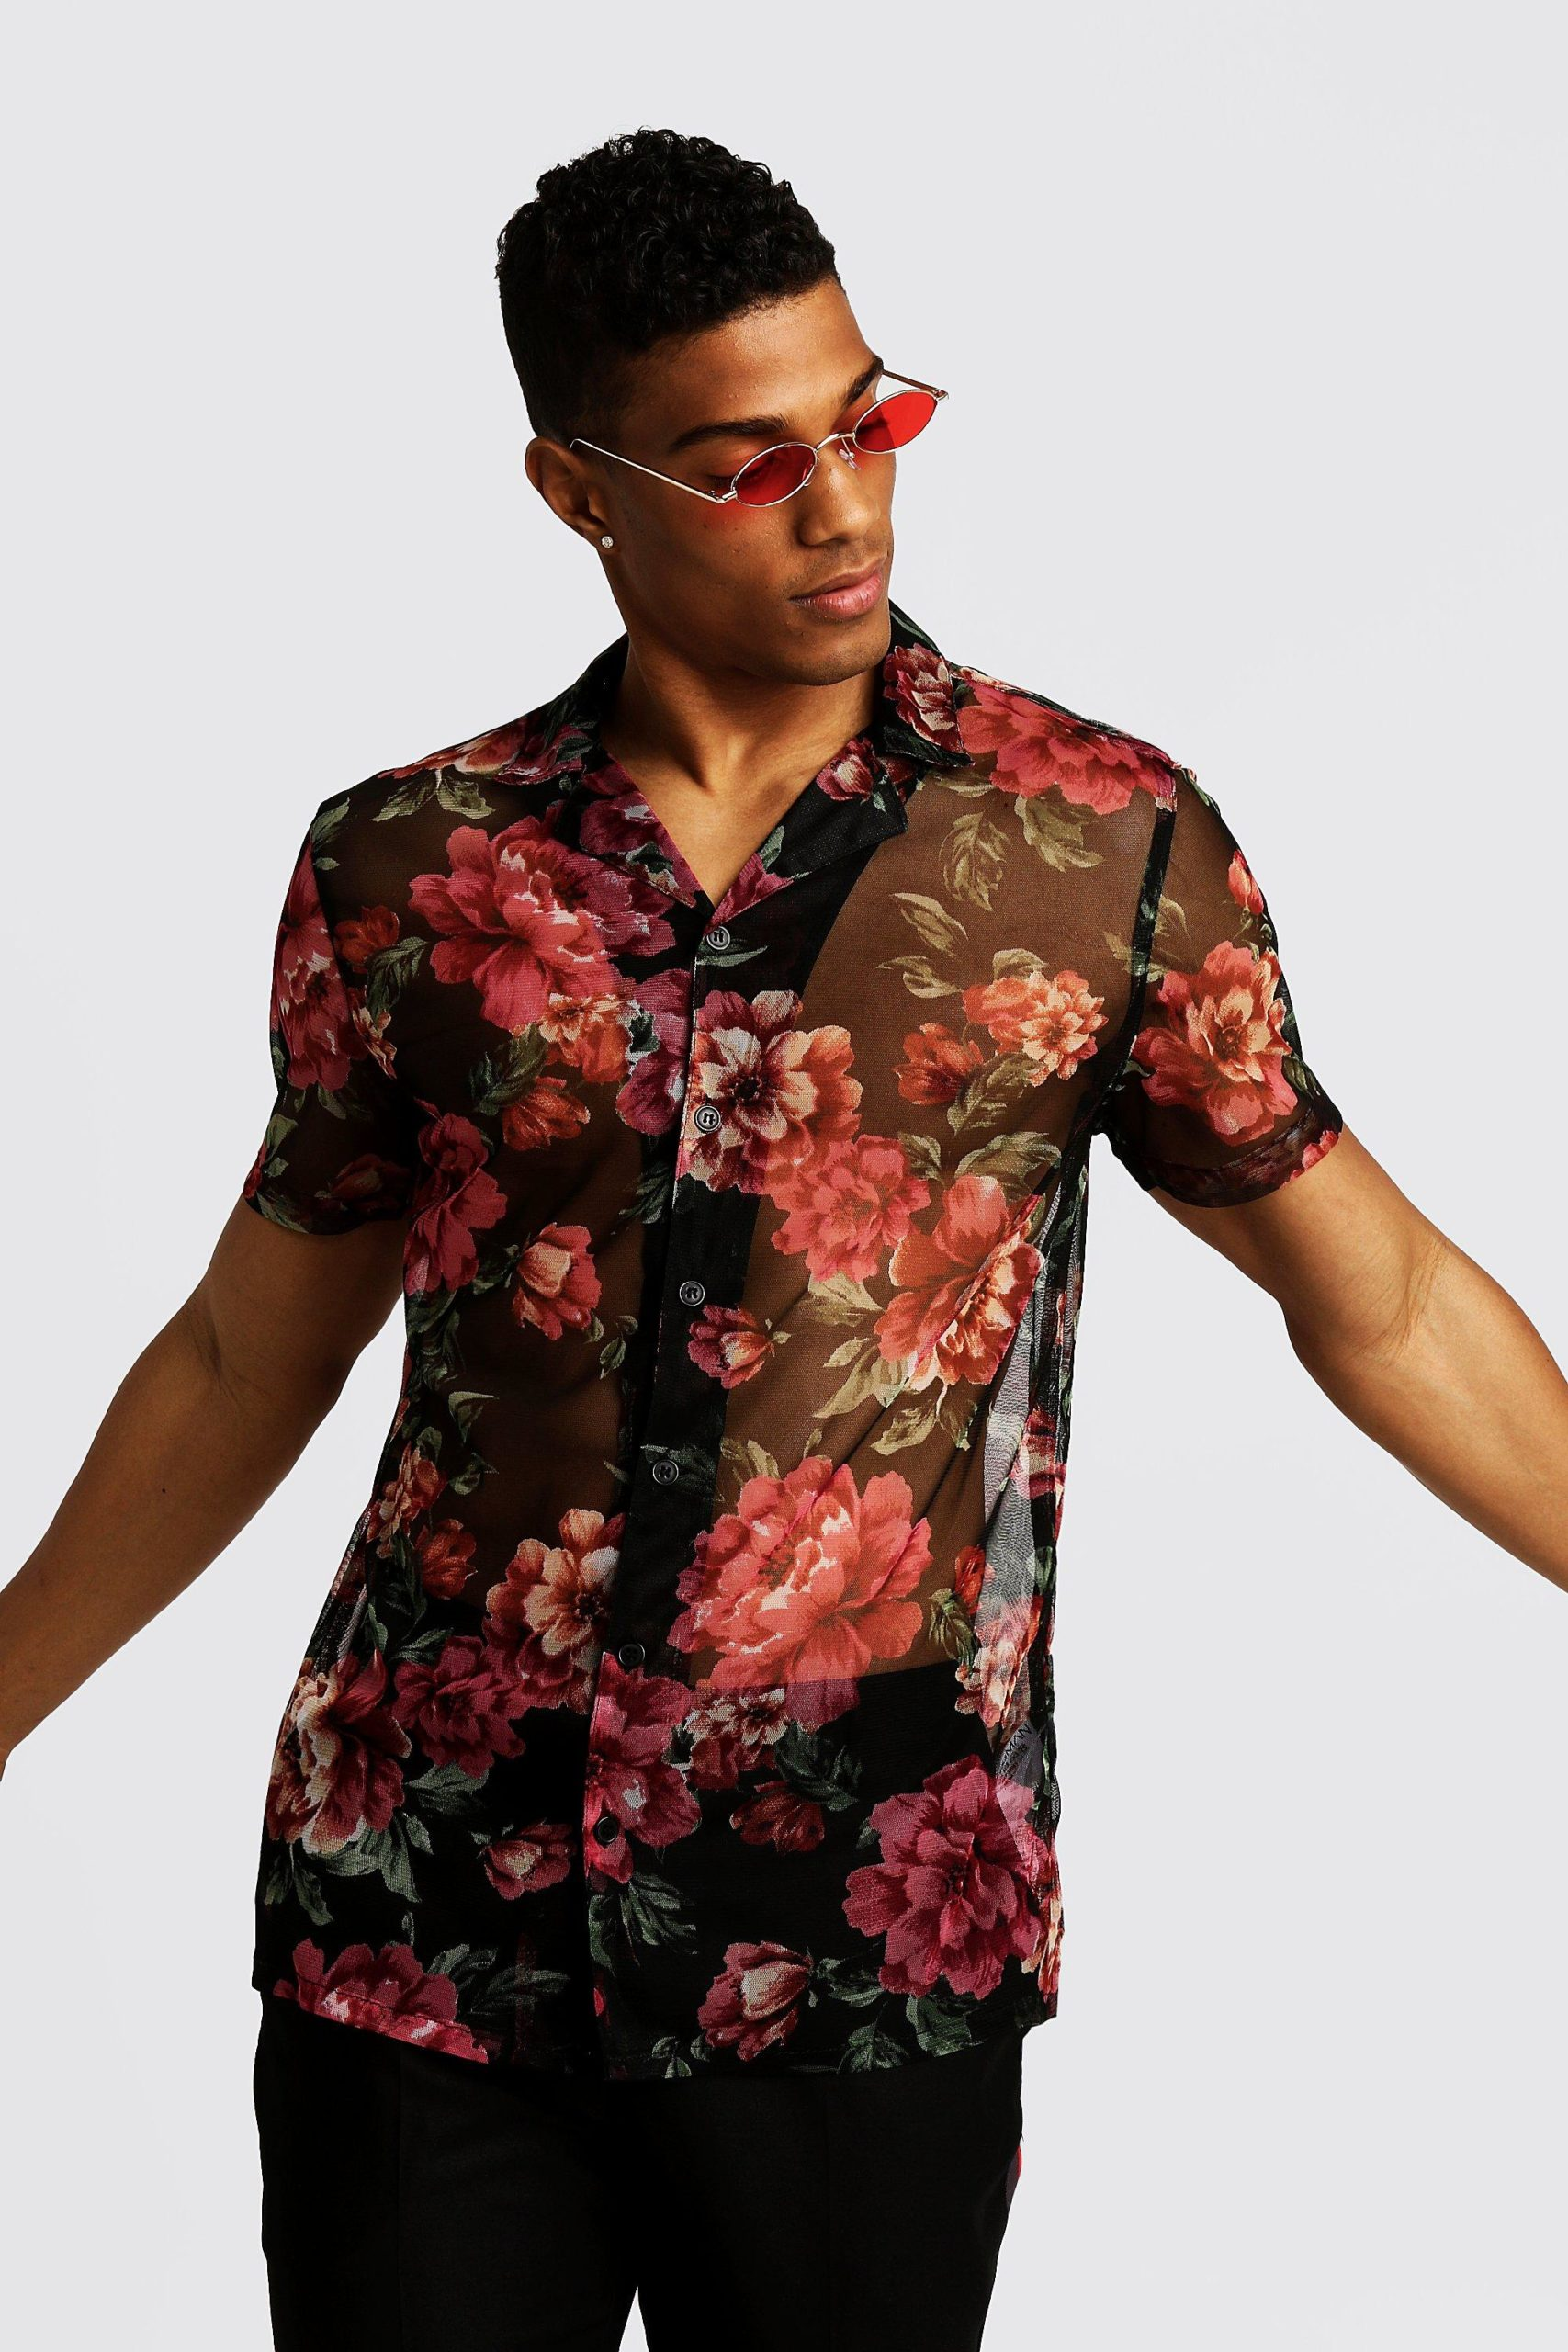 Mesh shirts